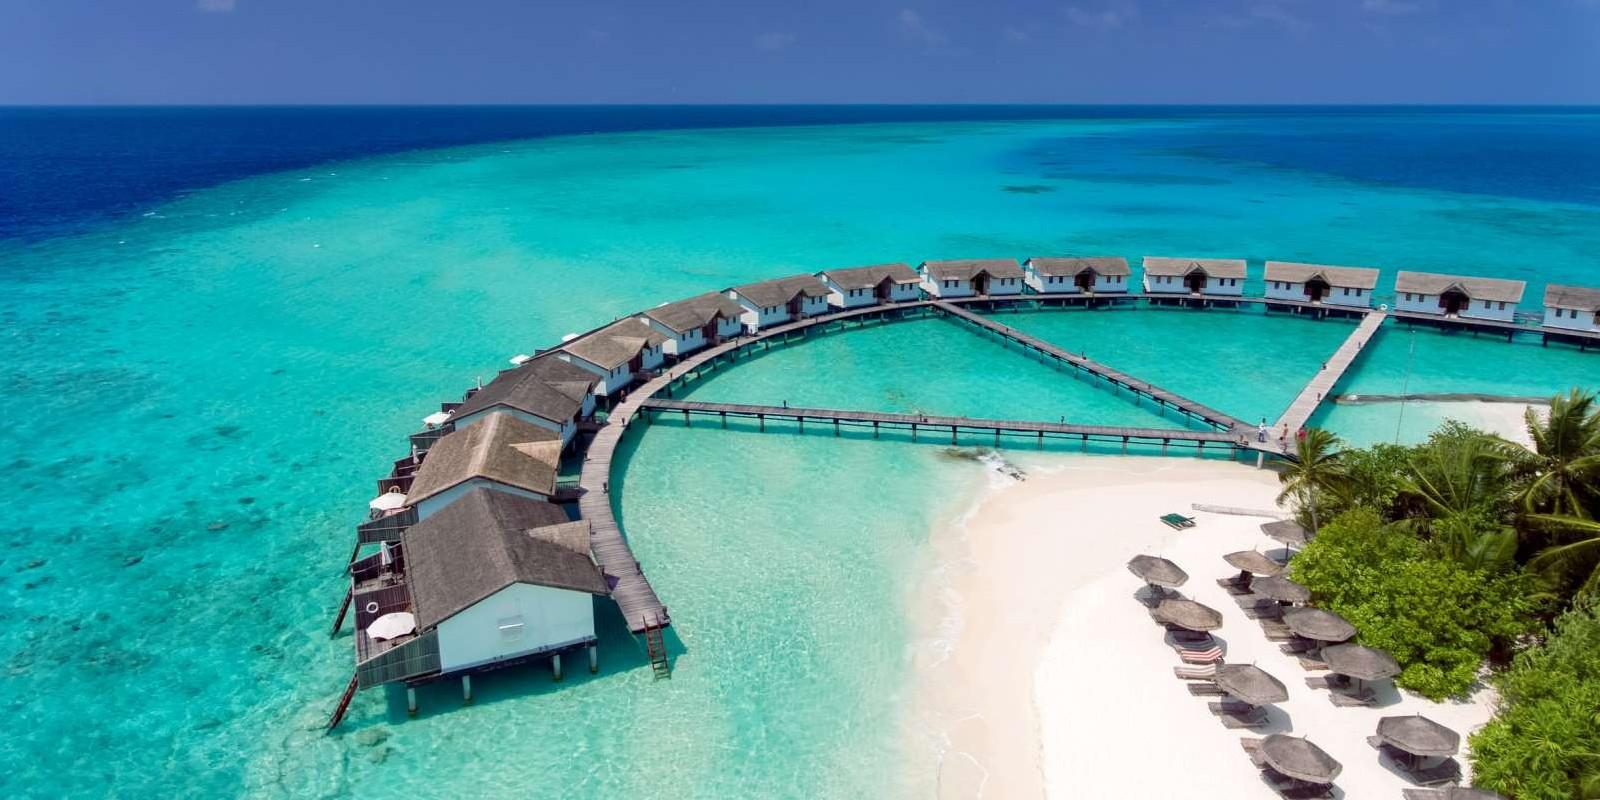 Travel blog: Top Eco-Friendy Resorts in the Indian Ocean